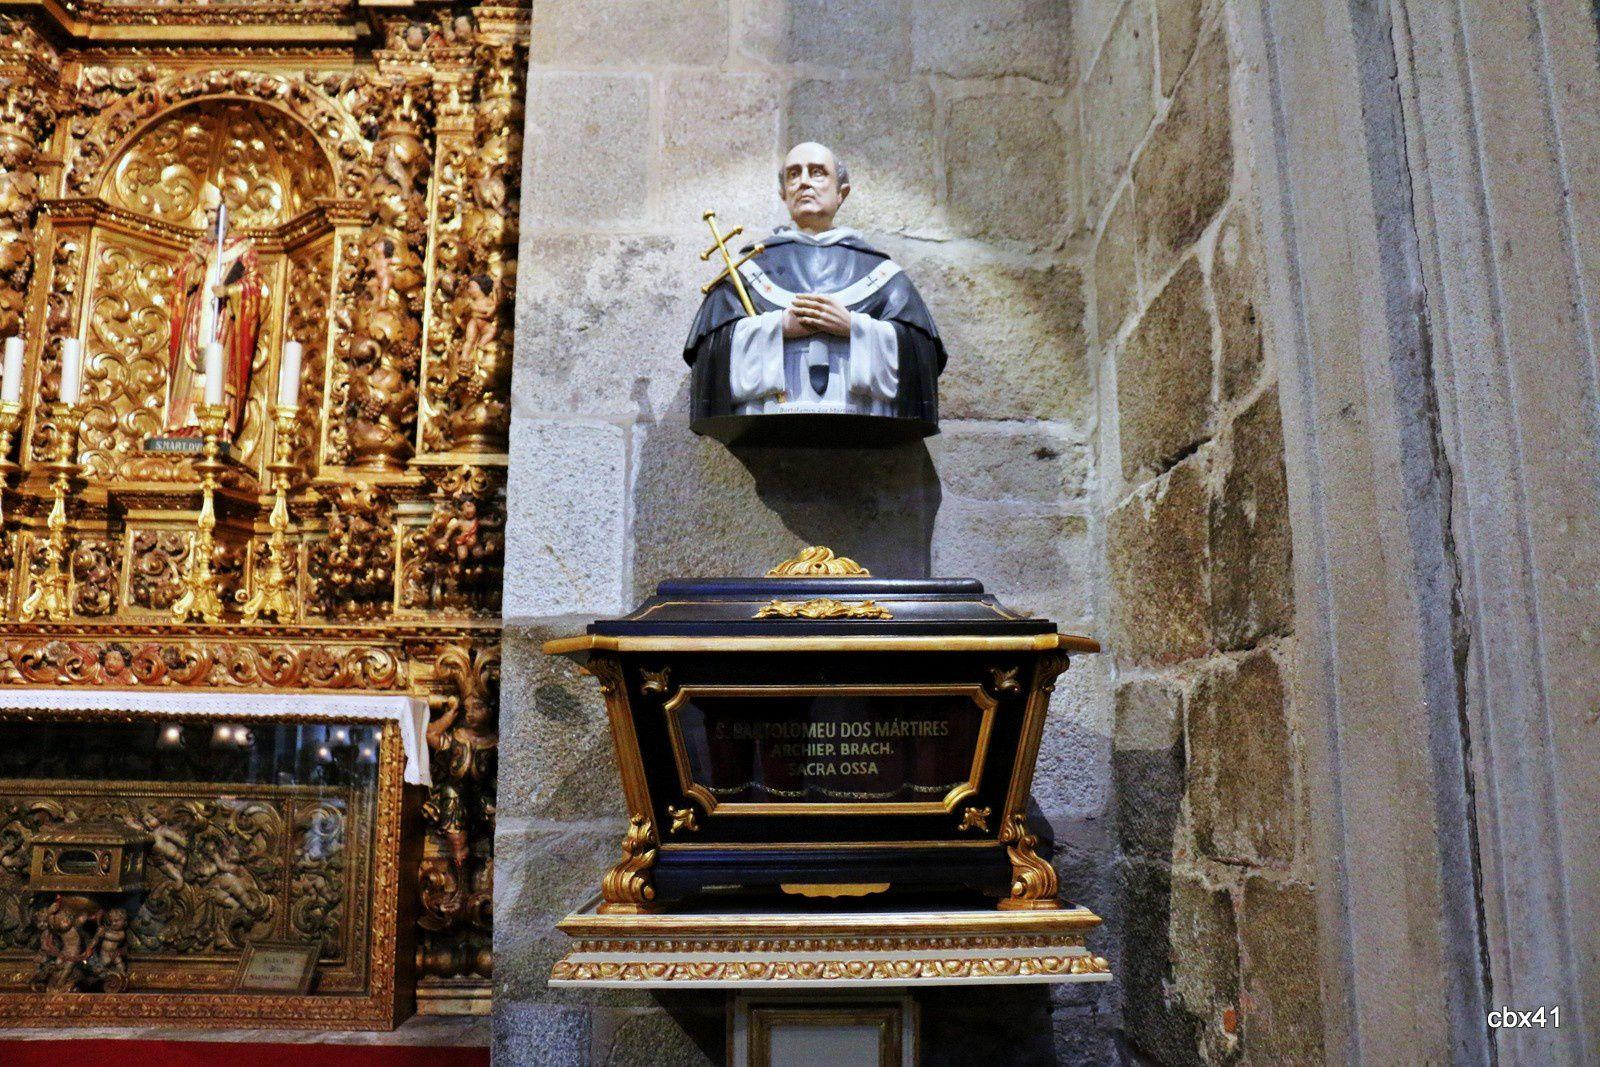 S. Bartolomeu dos Martires, cathédrale de Braga (Portugal)